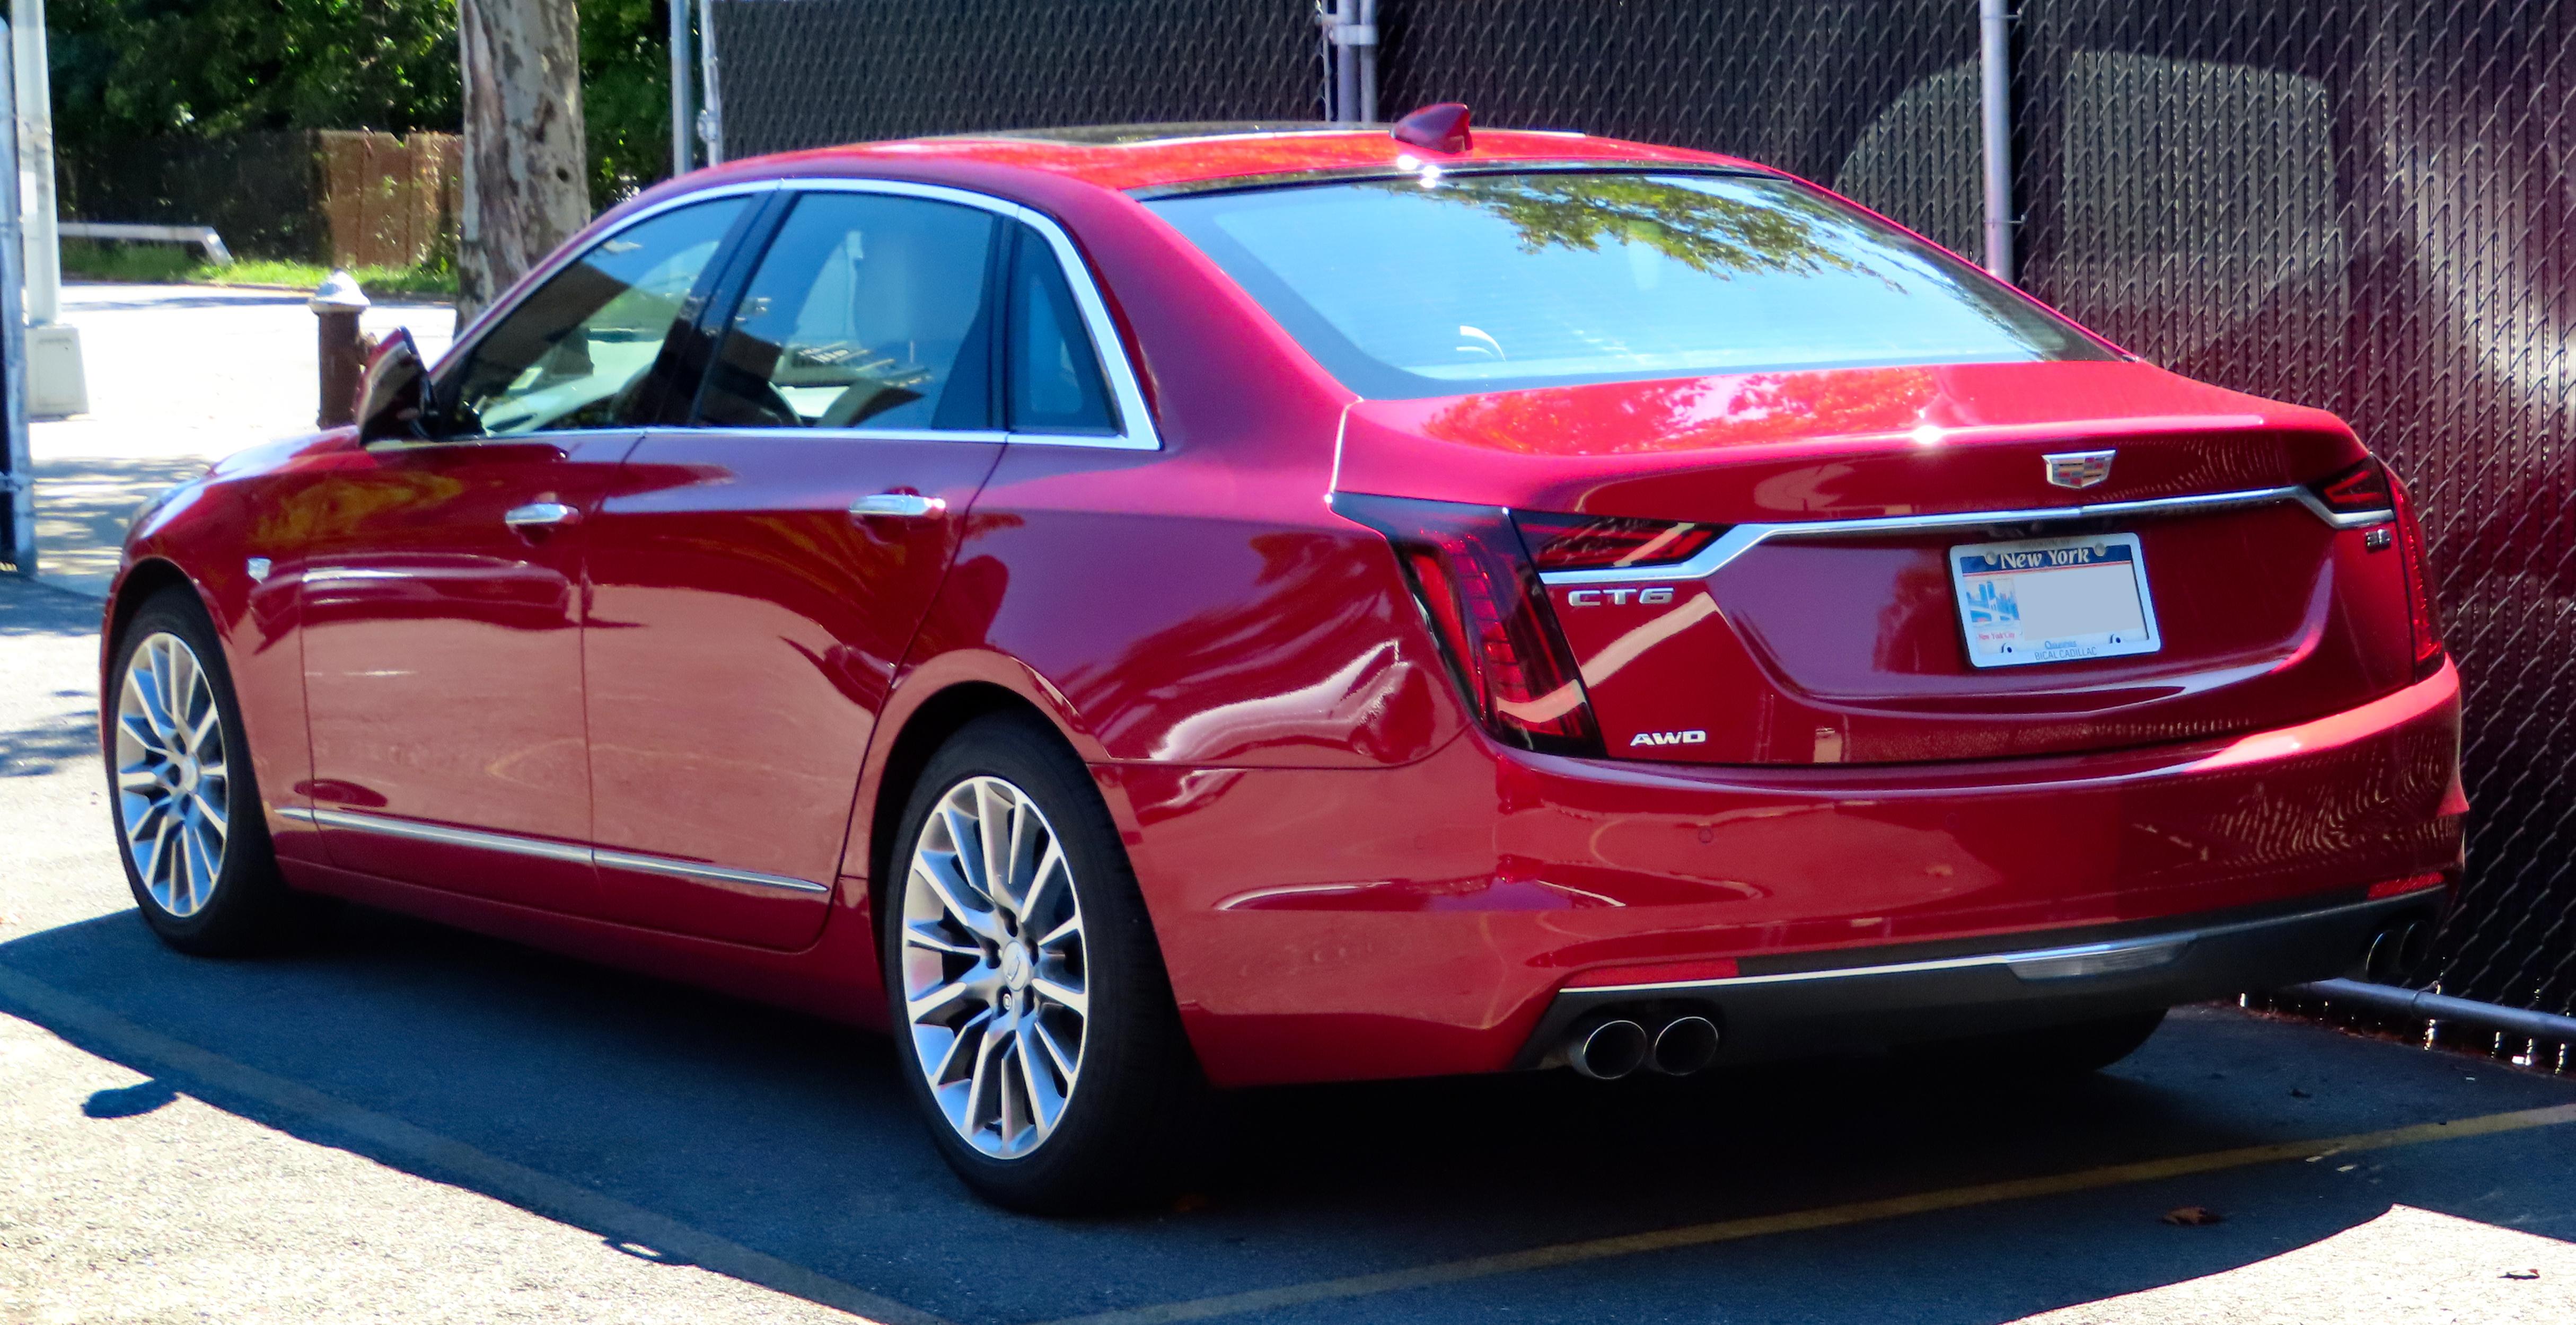 File:2019 Cadillac CT6 Premium Luxury, rear 8.28.19.jpg - Wikimedia Commons